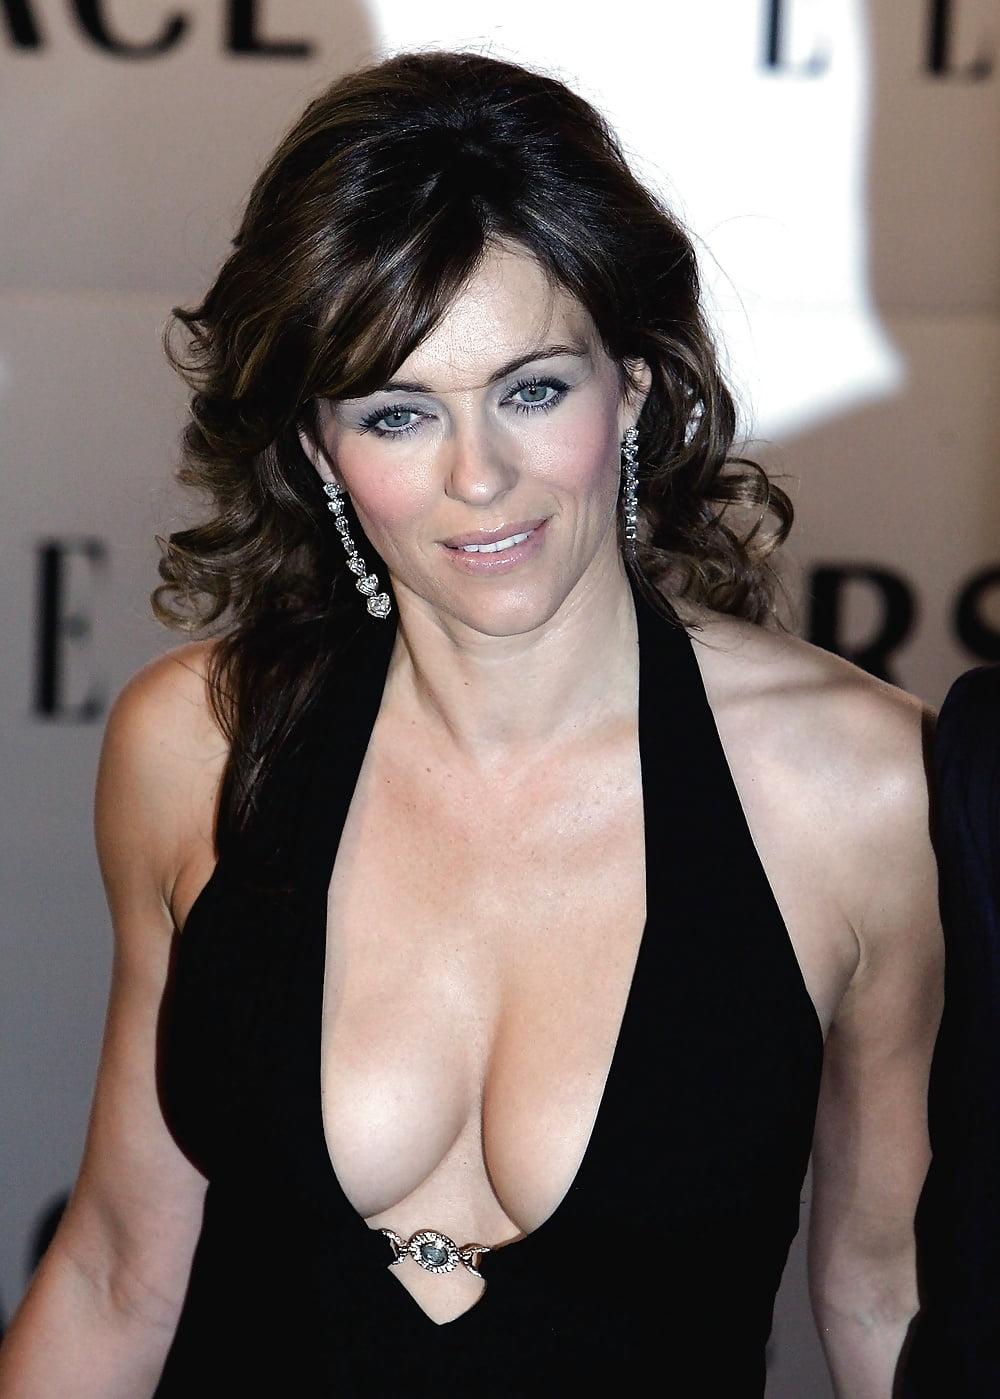 hottest-celebrity-milf-gif-schoolgirl-porn